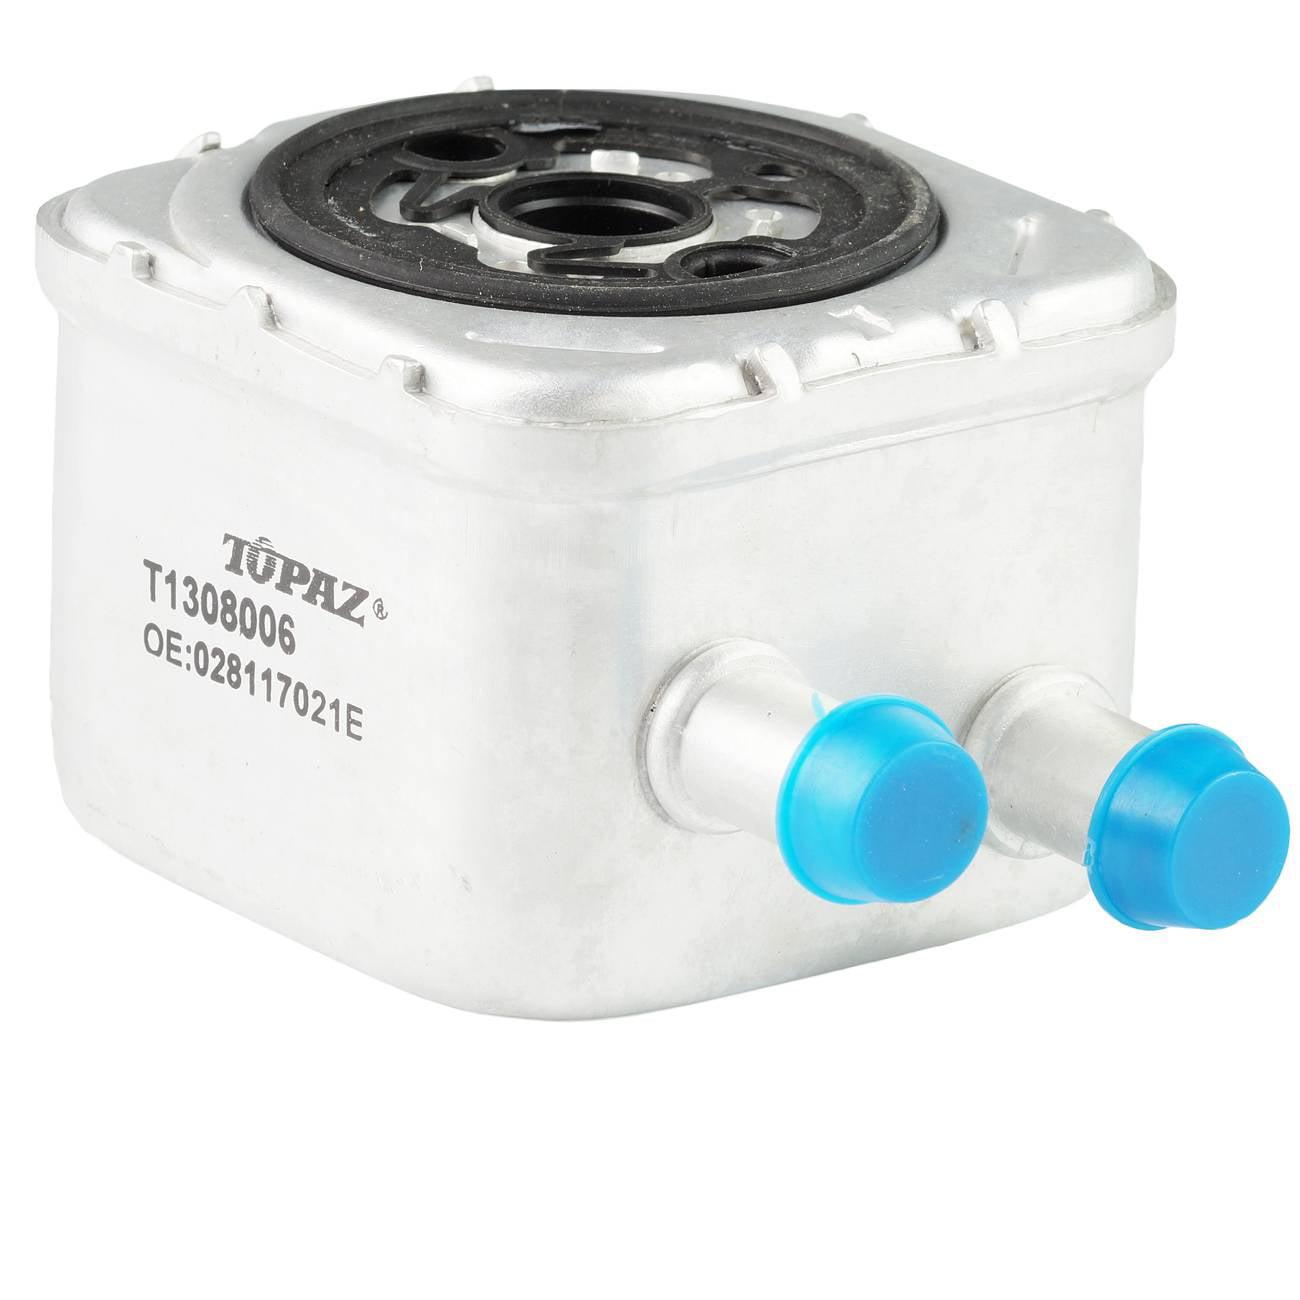 TOPAZ 028117021E Engine Oil Cooler for Volkswagen Golf Passat Audi A4 A6 Quattro S4